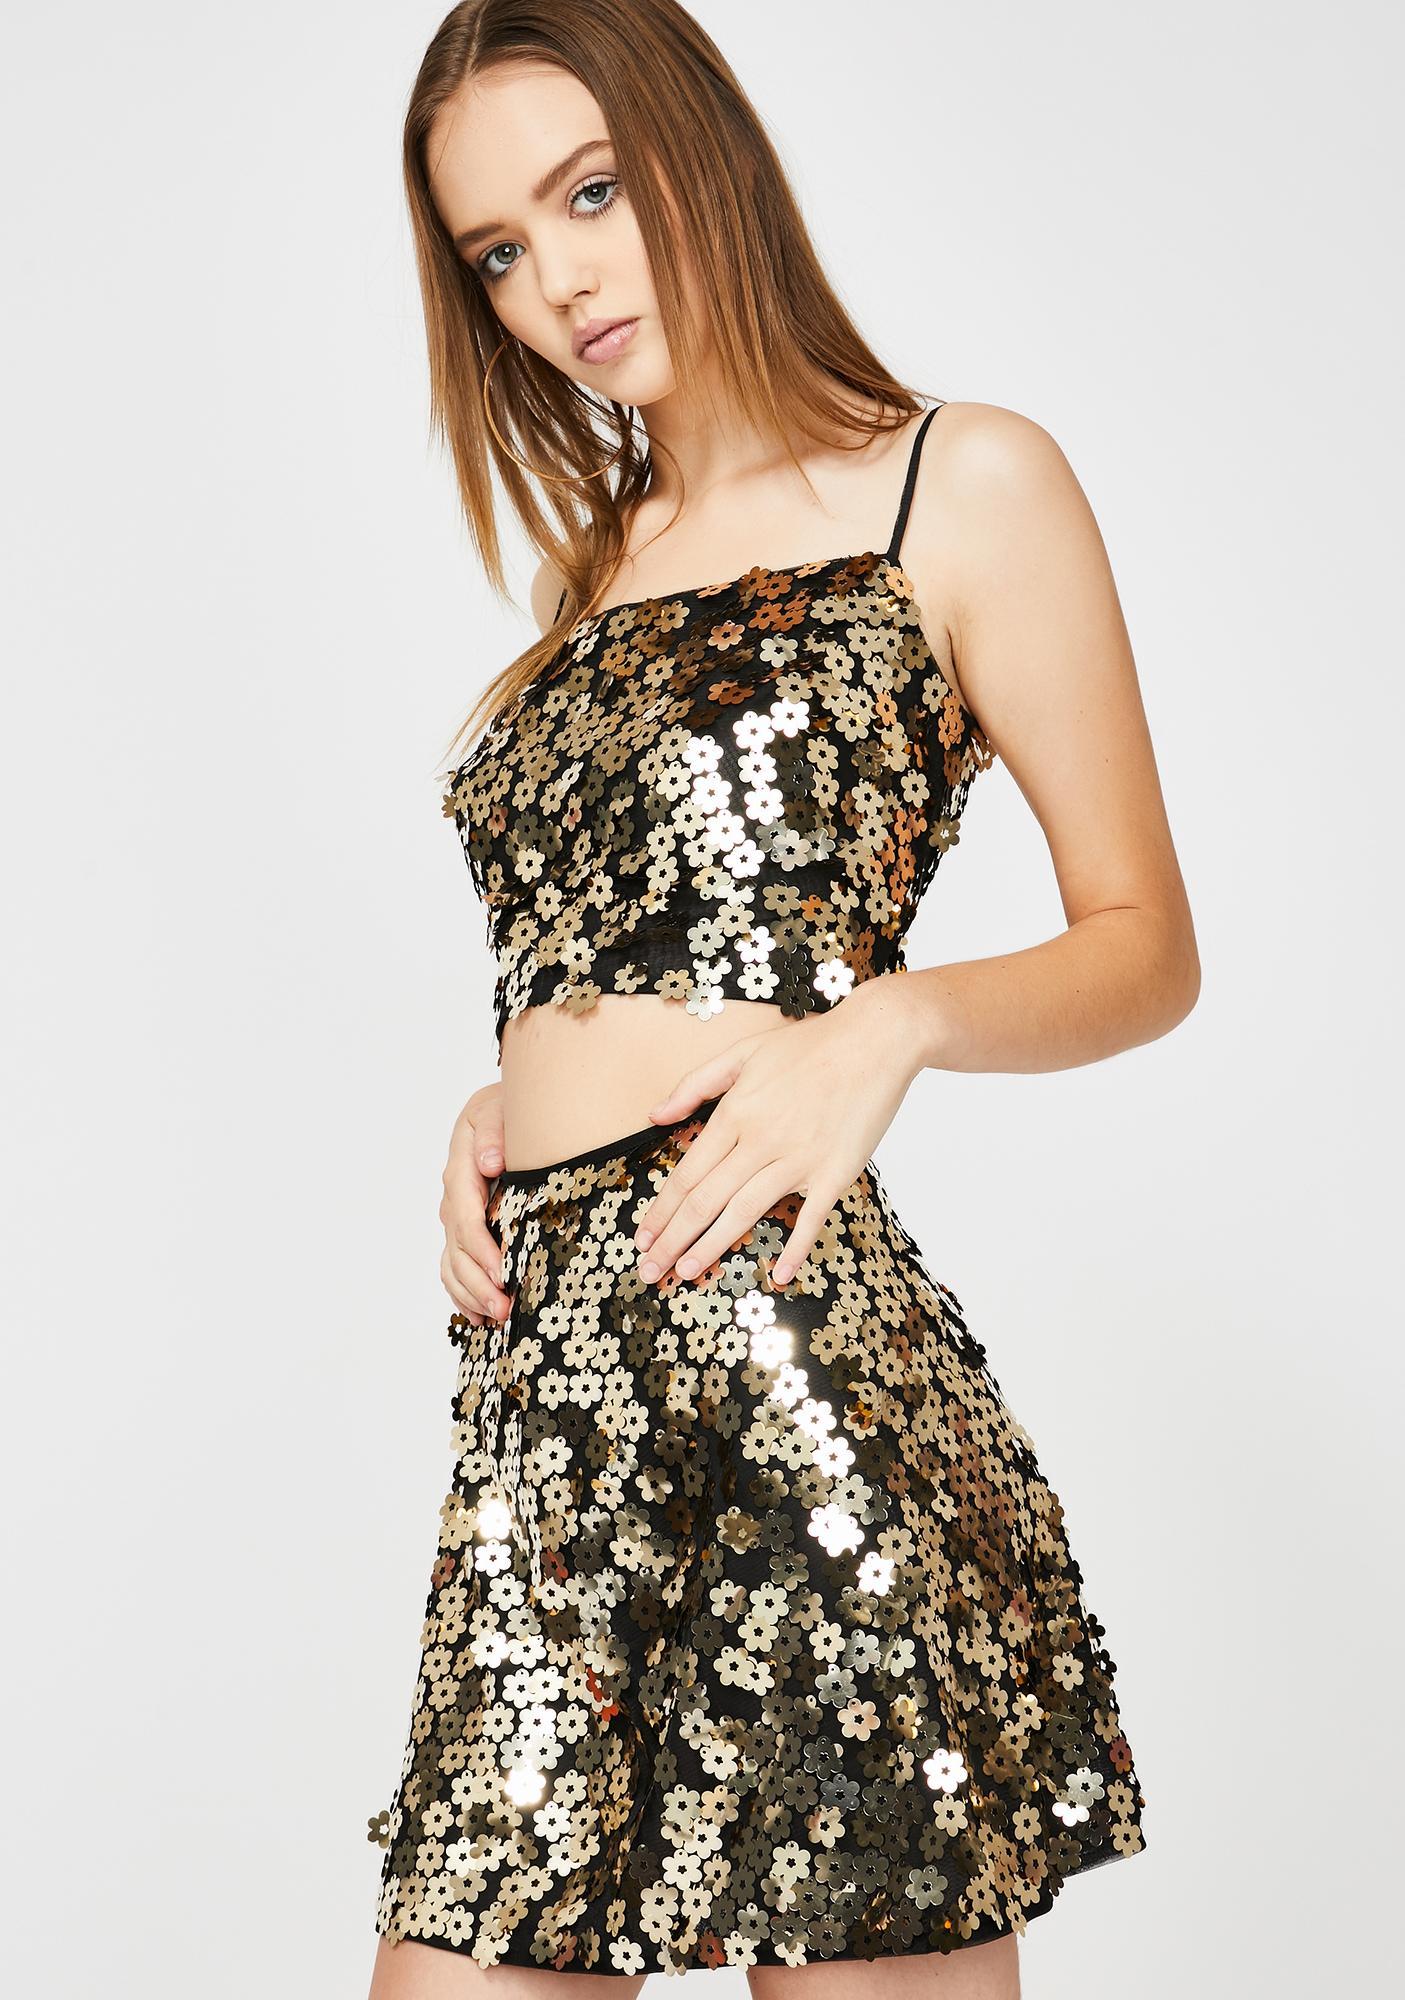 Lirika Matoshi Gold Flower Sequin Set